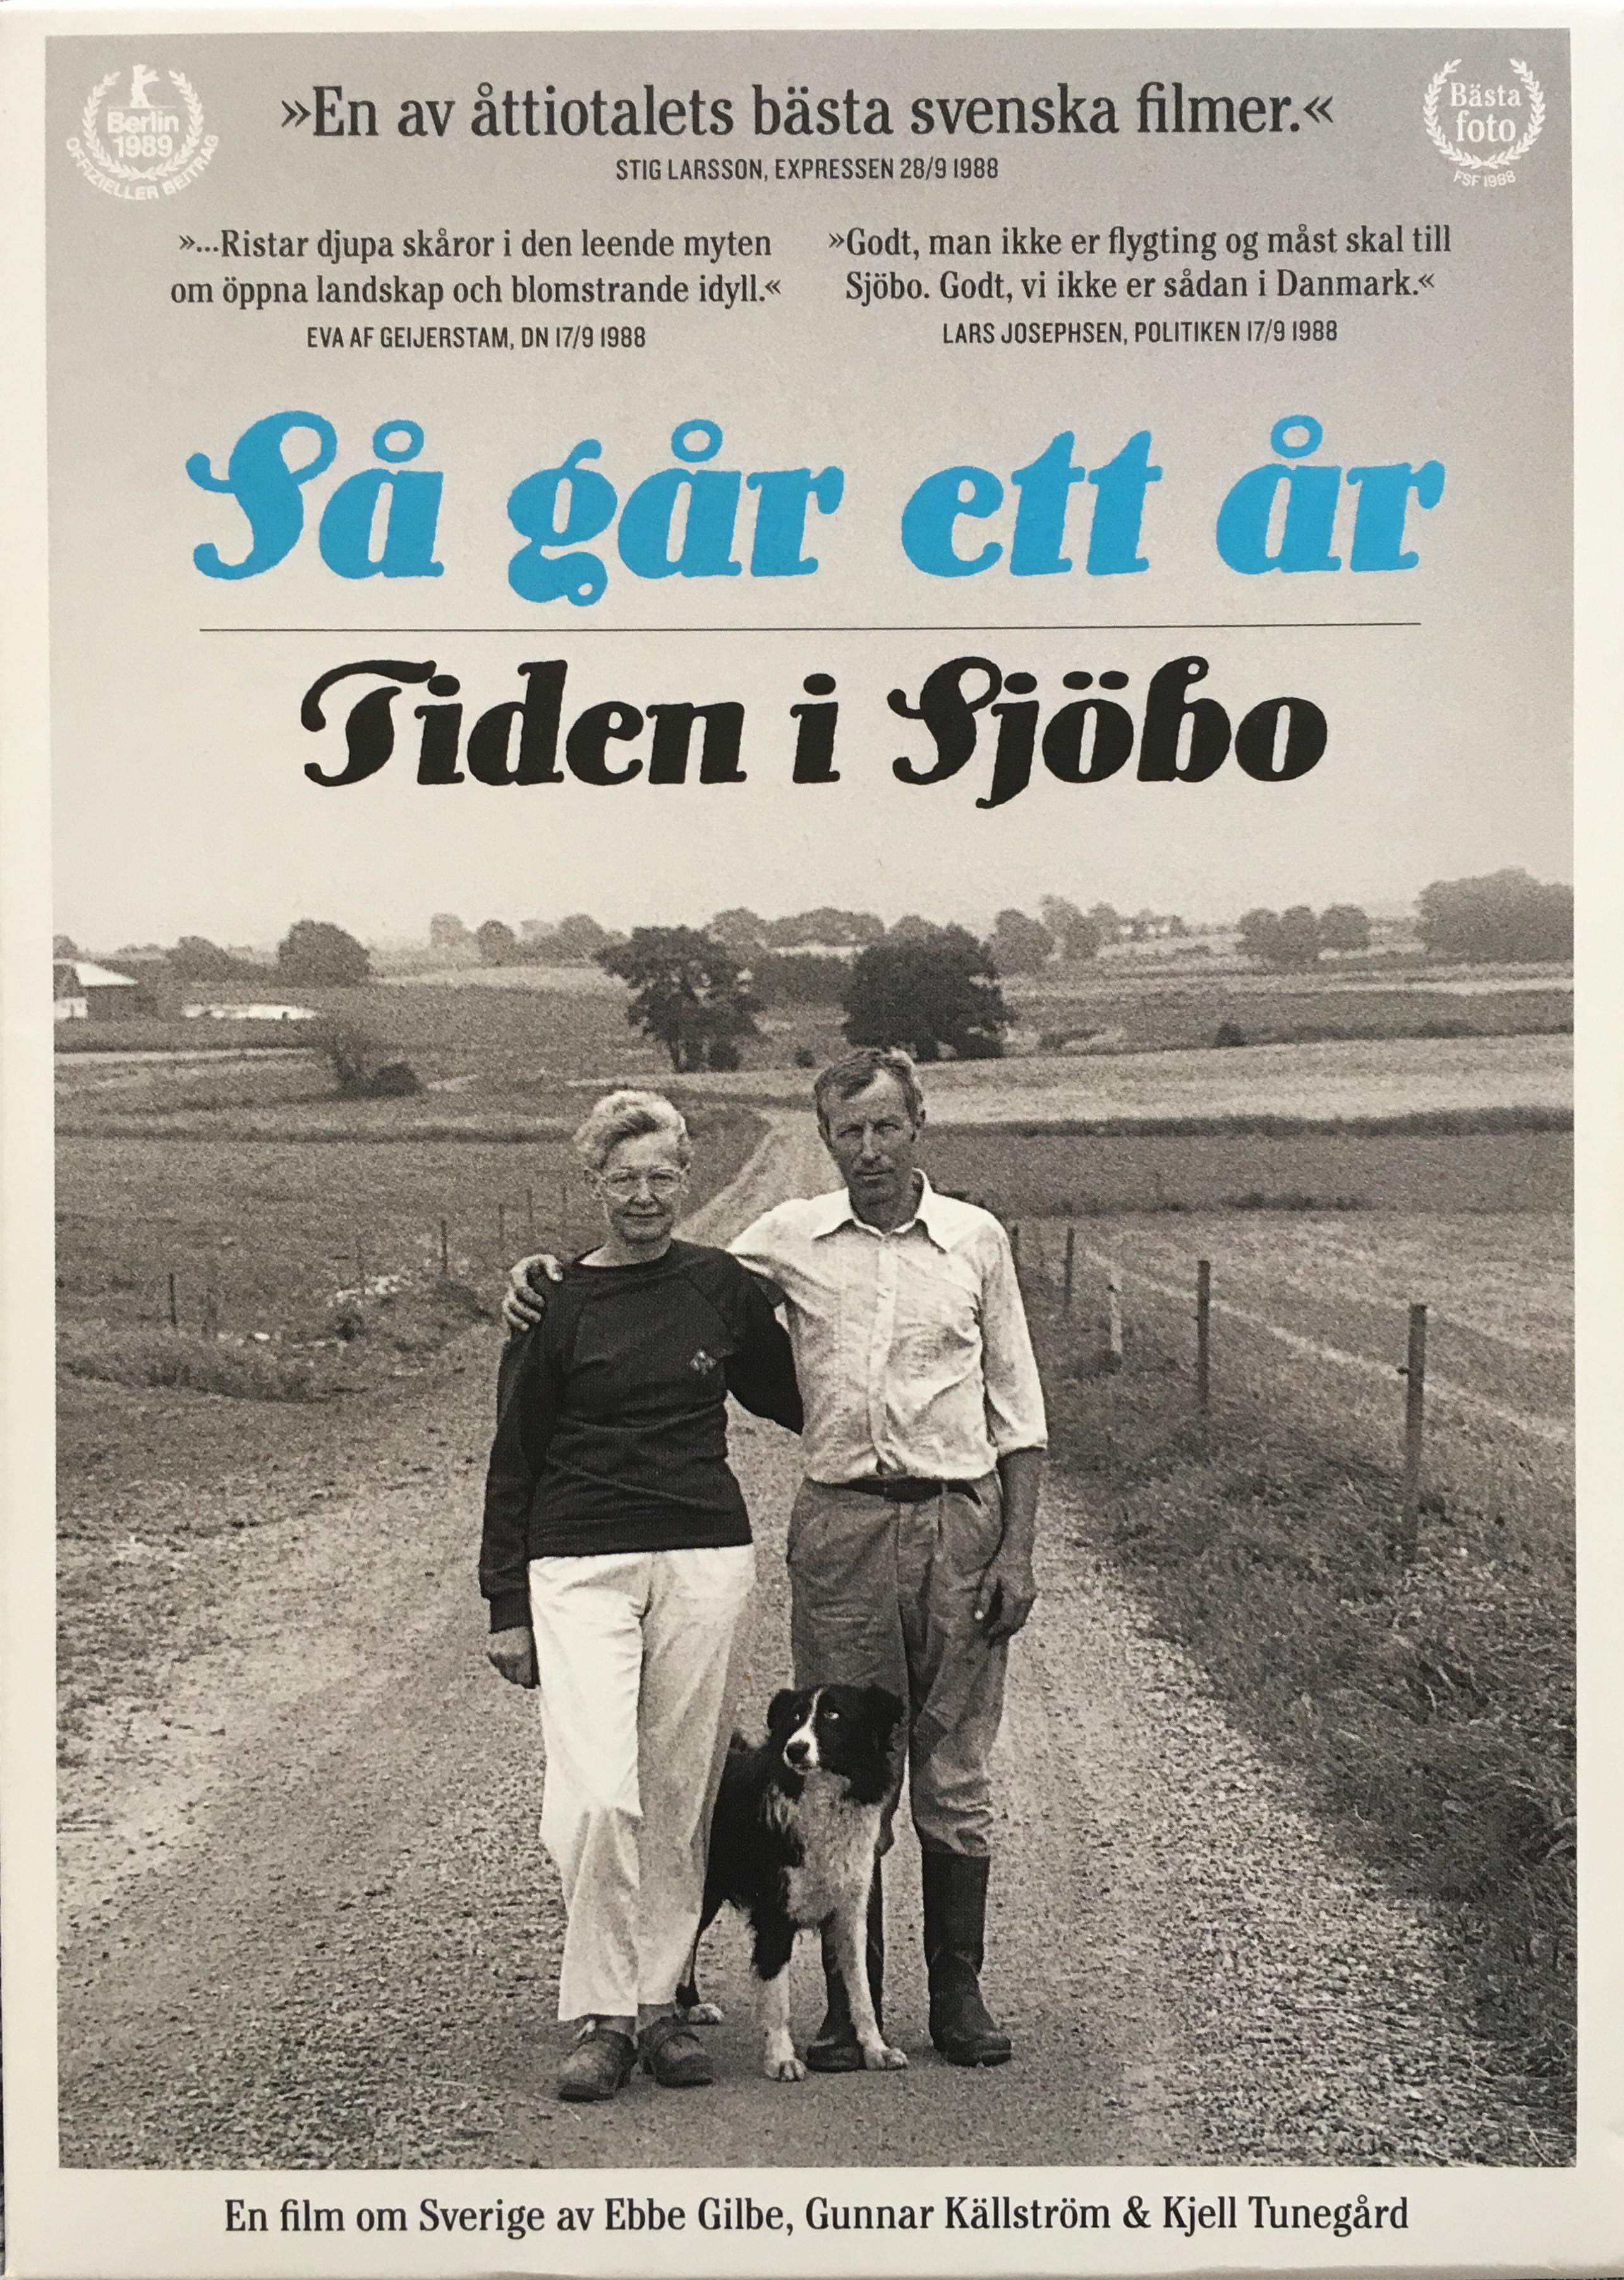 Basta Svenska dating site